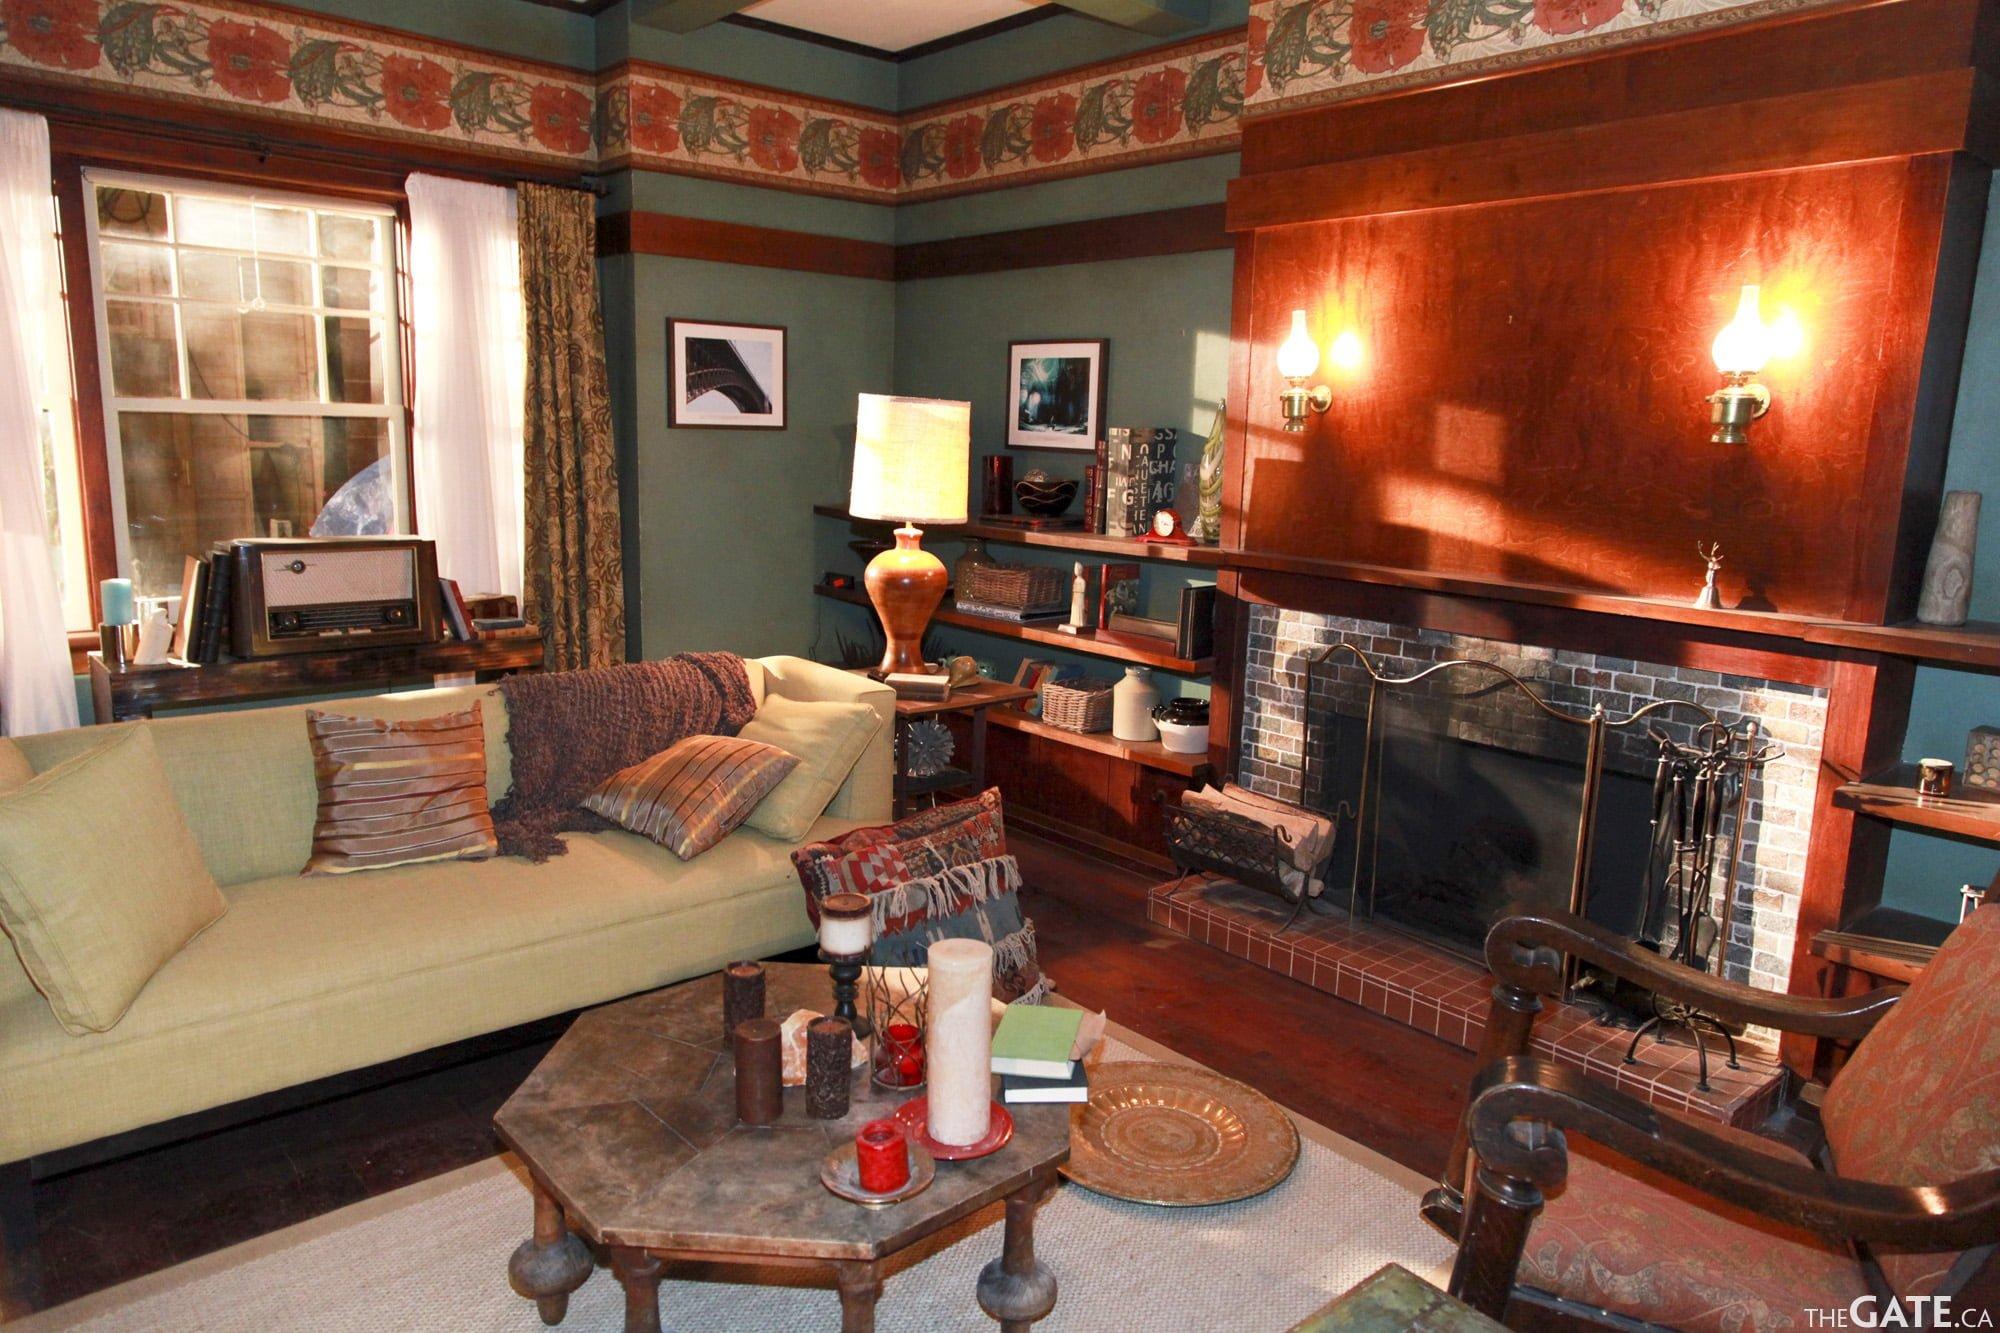 Rafe McCawley's retro living room